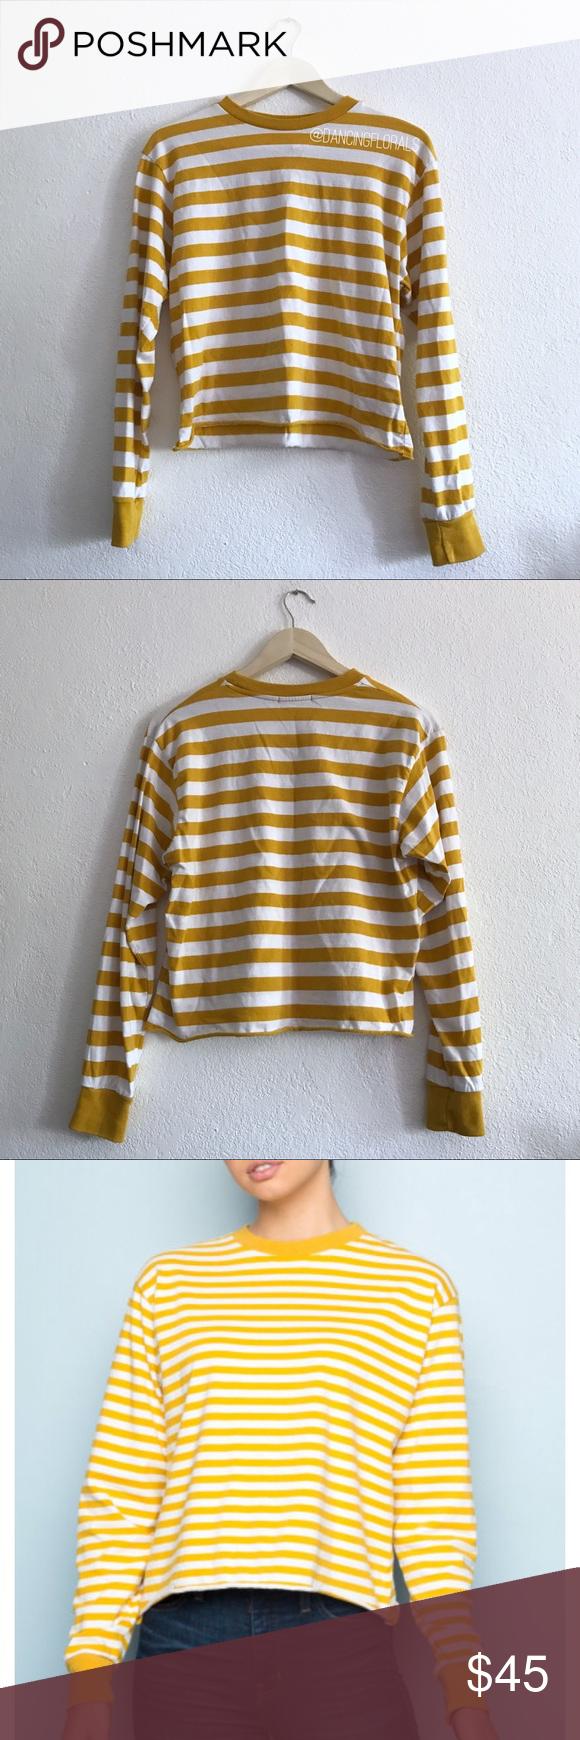 b834aeef6d Long Sleeve Tops · Italy · Brandy Melville Acacia deep yellow mustard  sweater Brandy Melville Deep yellow mustard and white striped Acacia